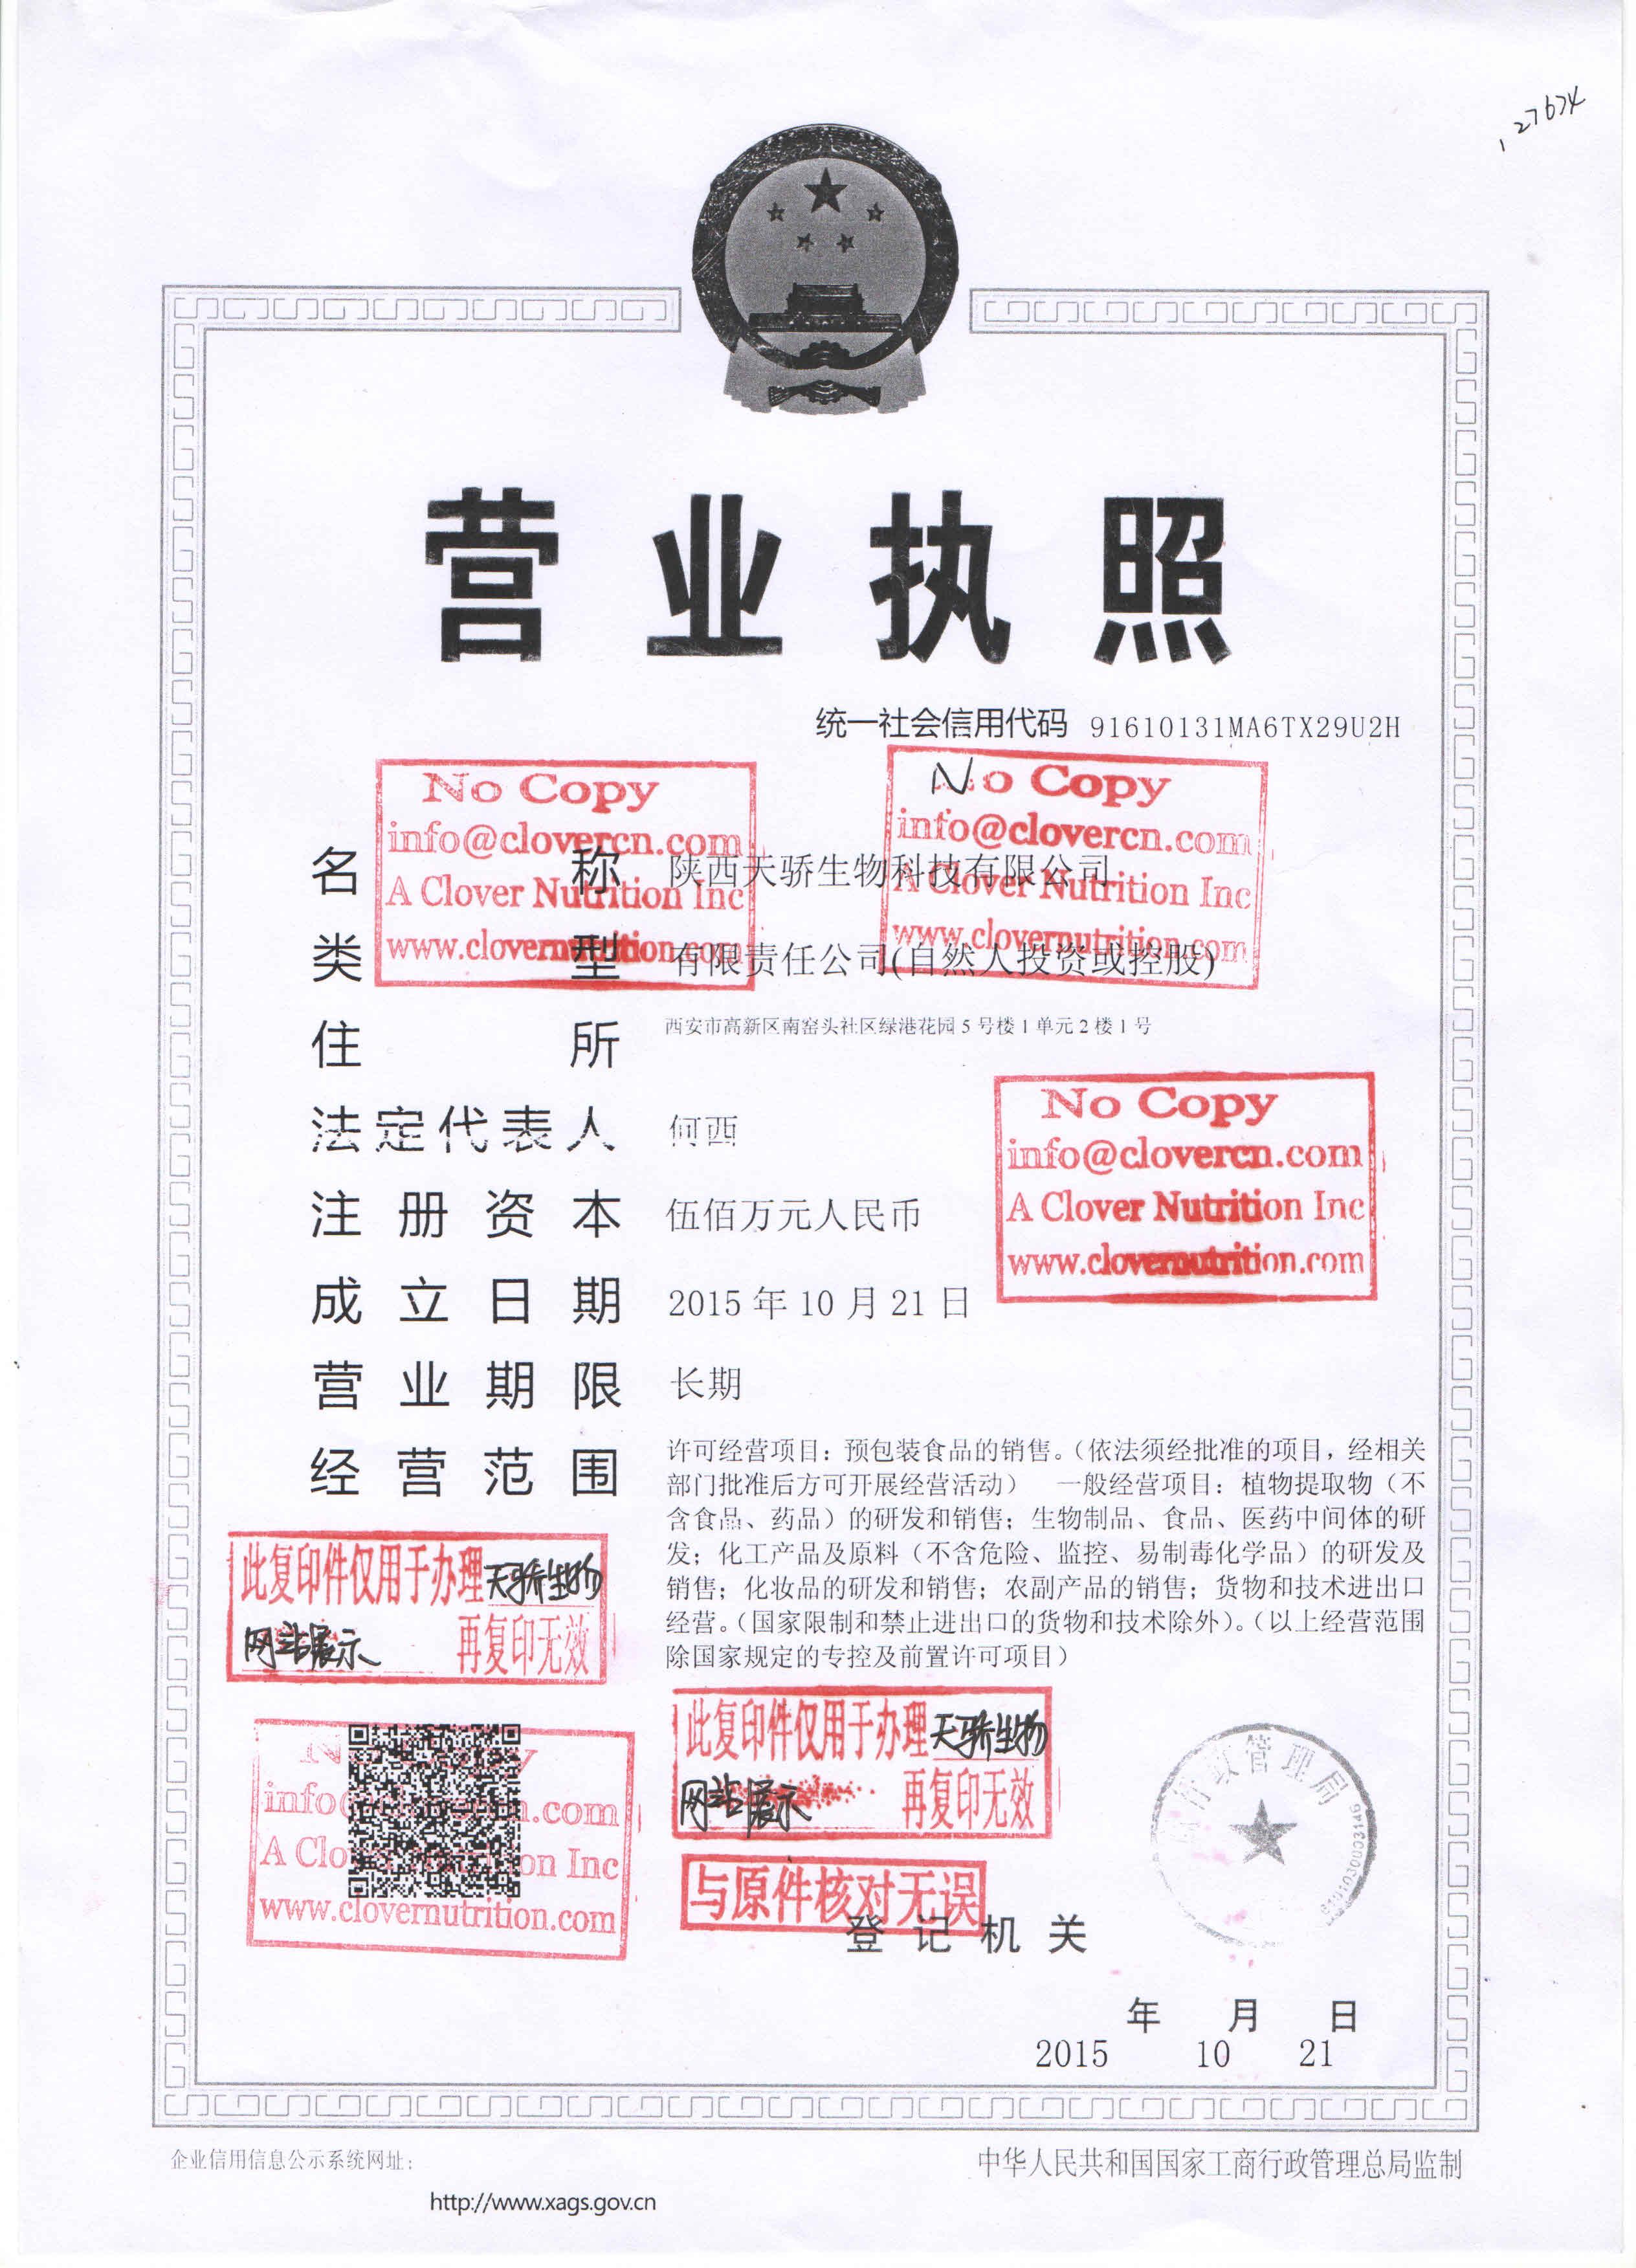 A Clover Nutrition Inc Business License